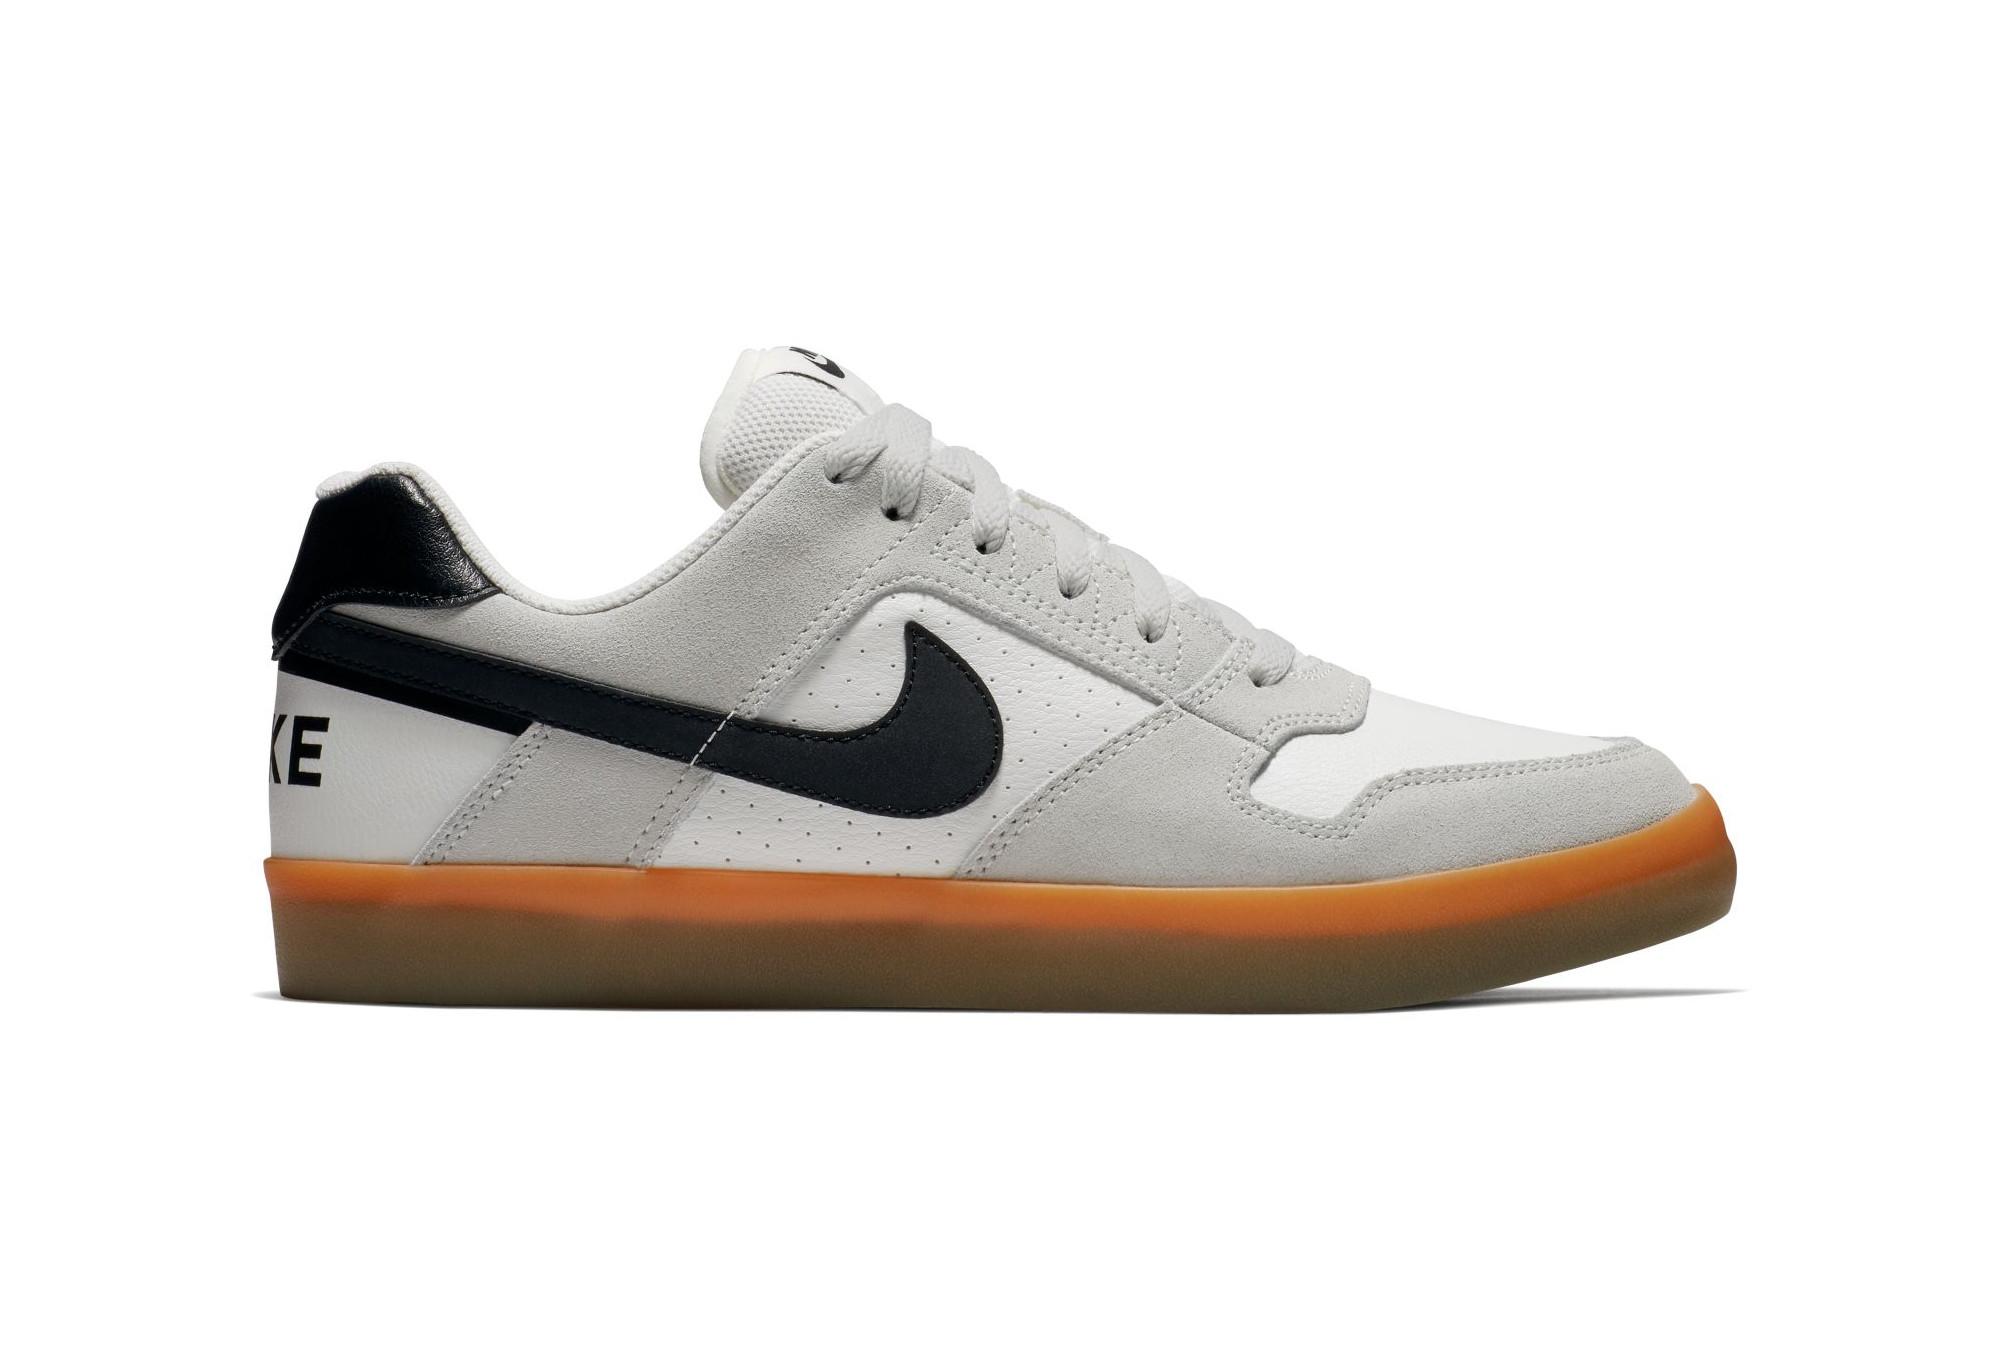 e181d33c38df6 Zapatillas Nike SB Delta Force Vulc blancas   negras